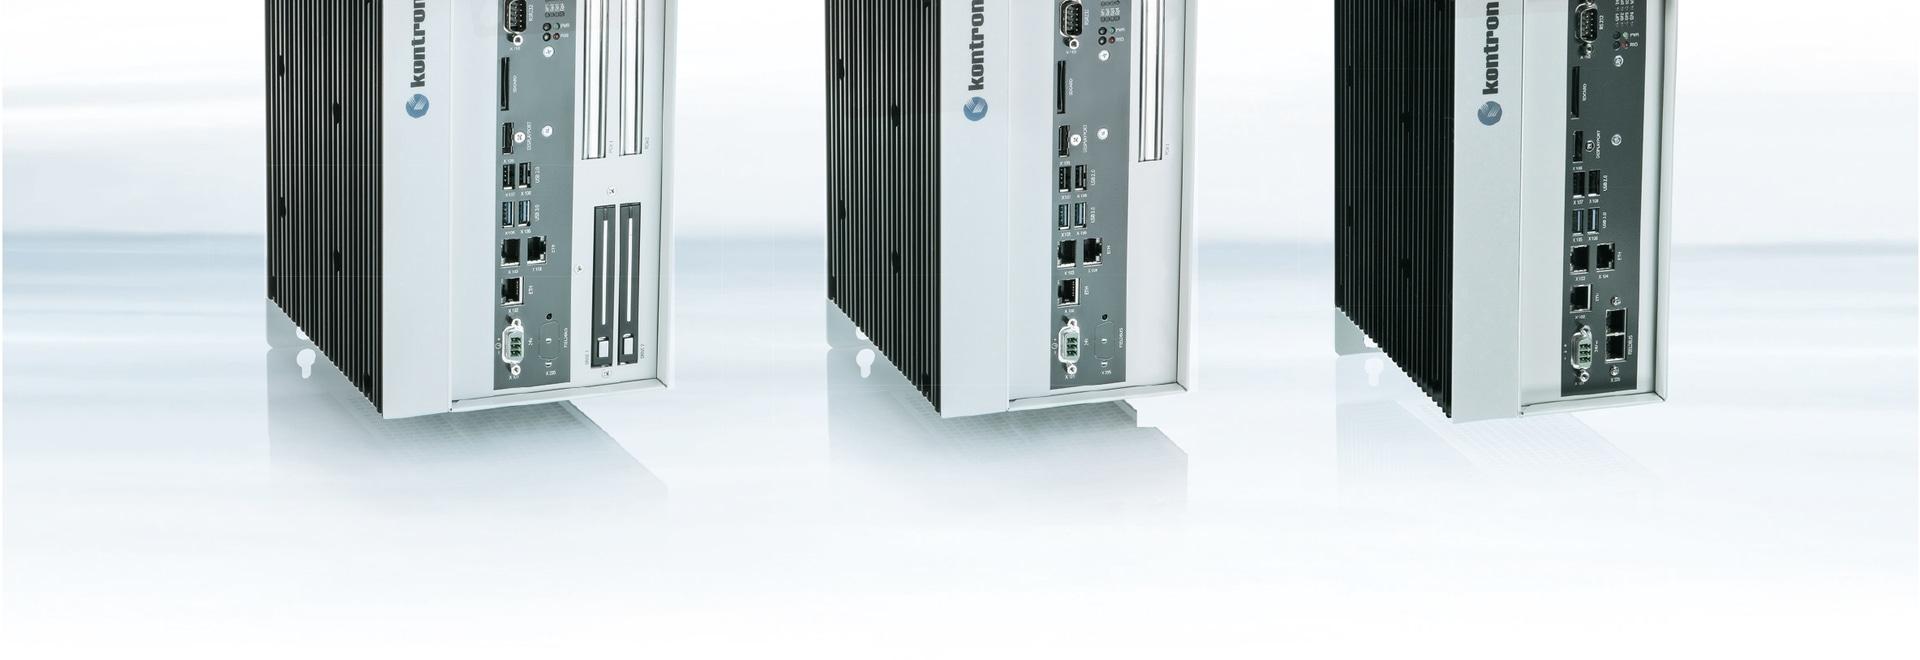 Kontron KBox C-102 Series: High Performance, Scalability, and Maintenance-Free Design